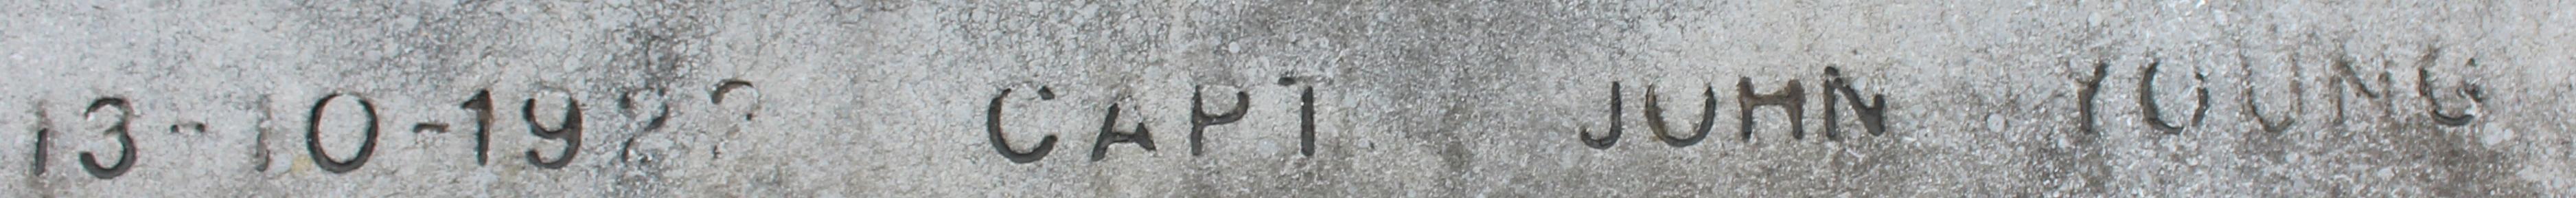 john-young-grave